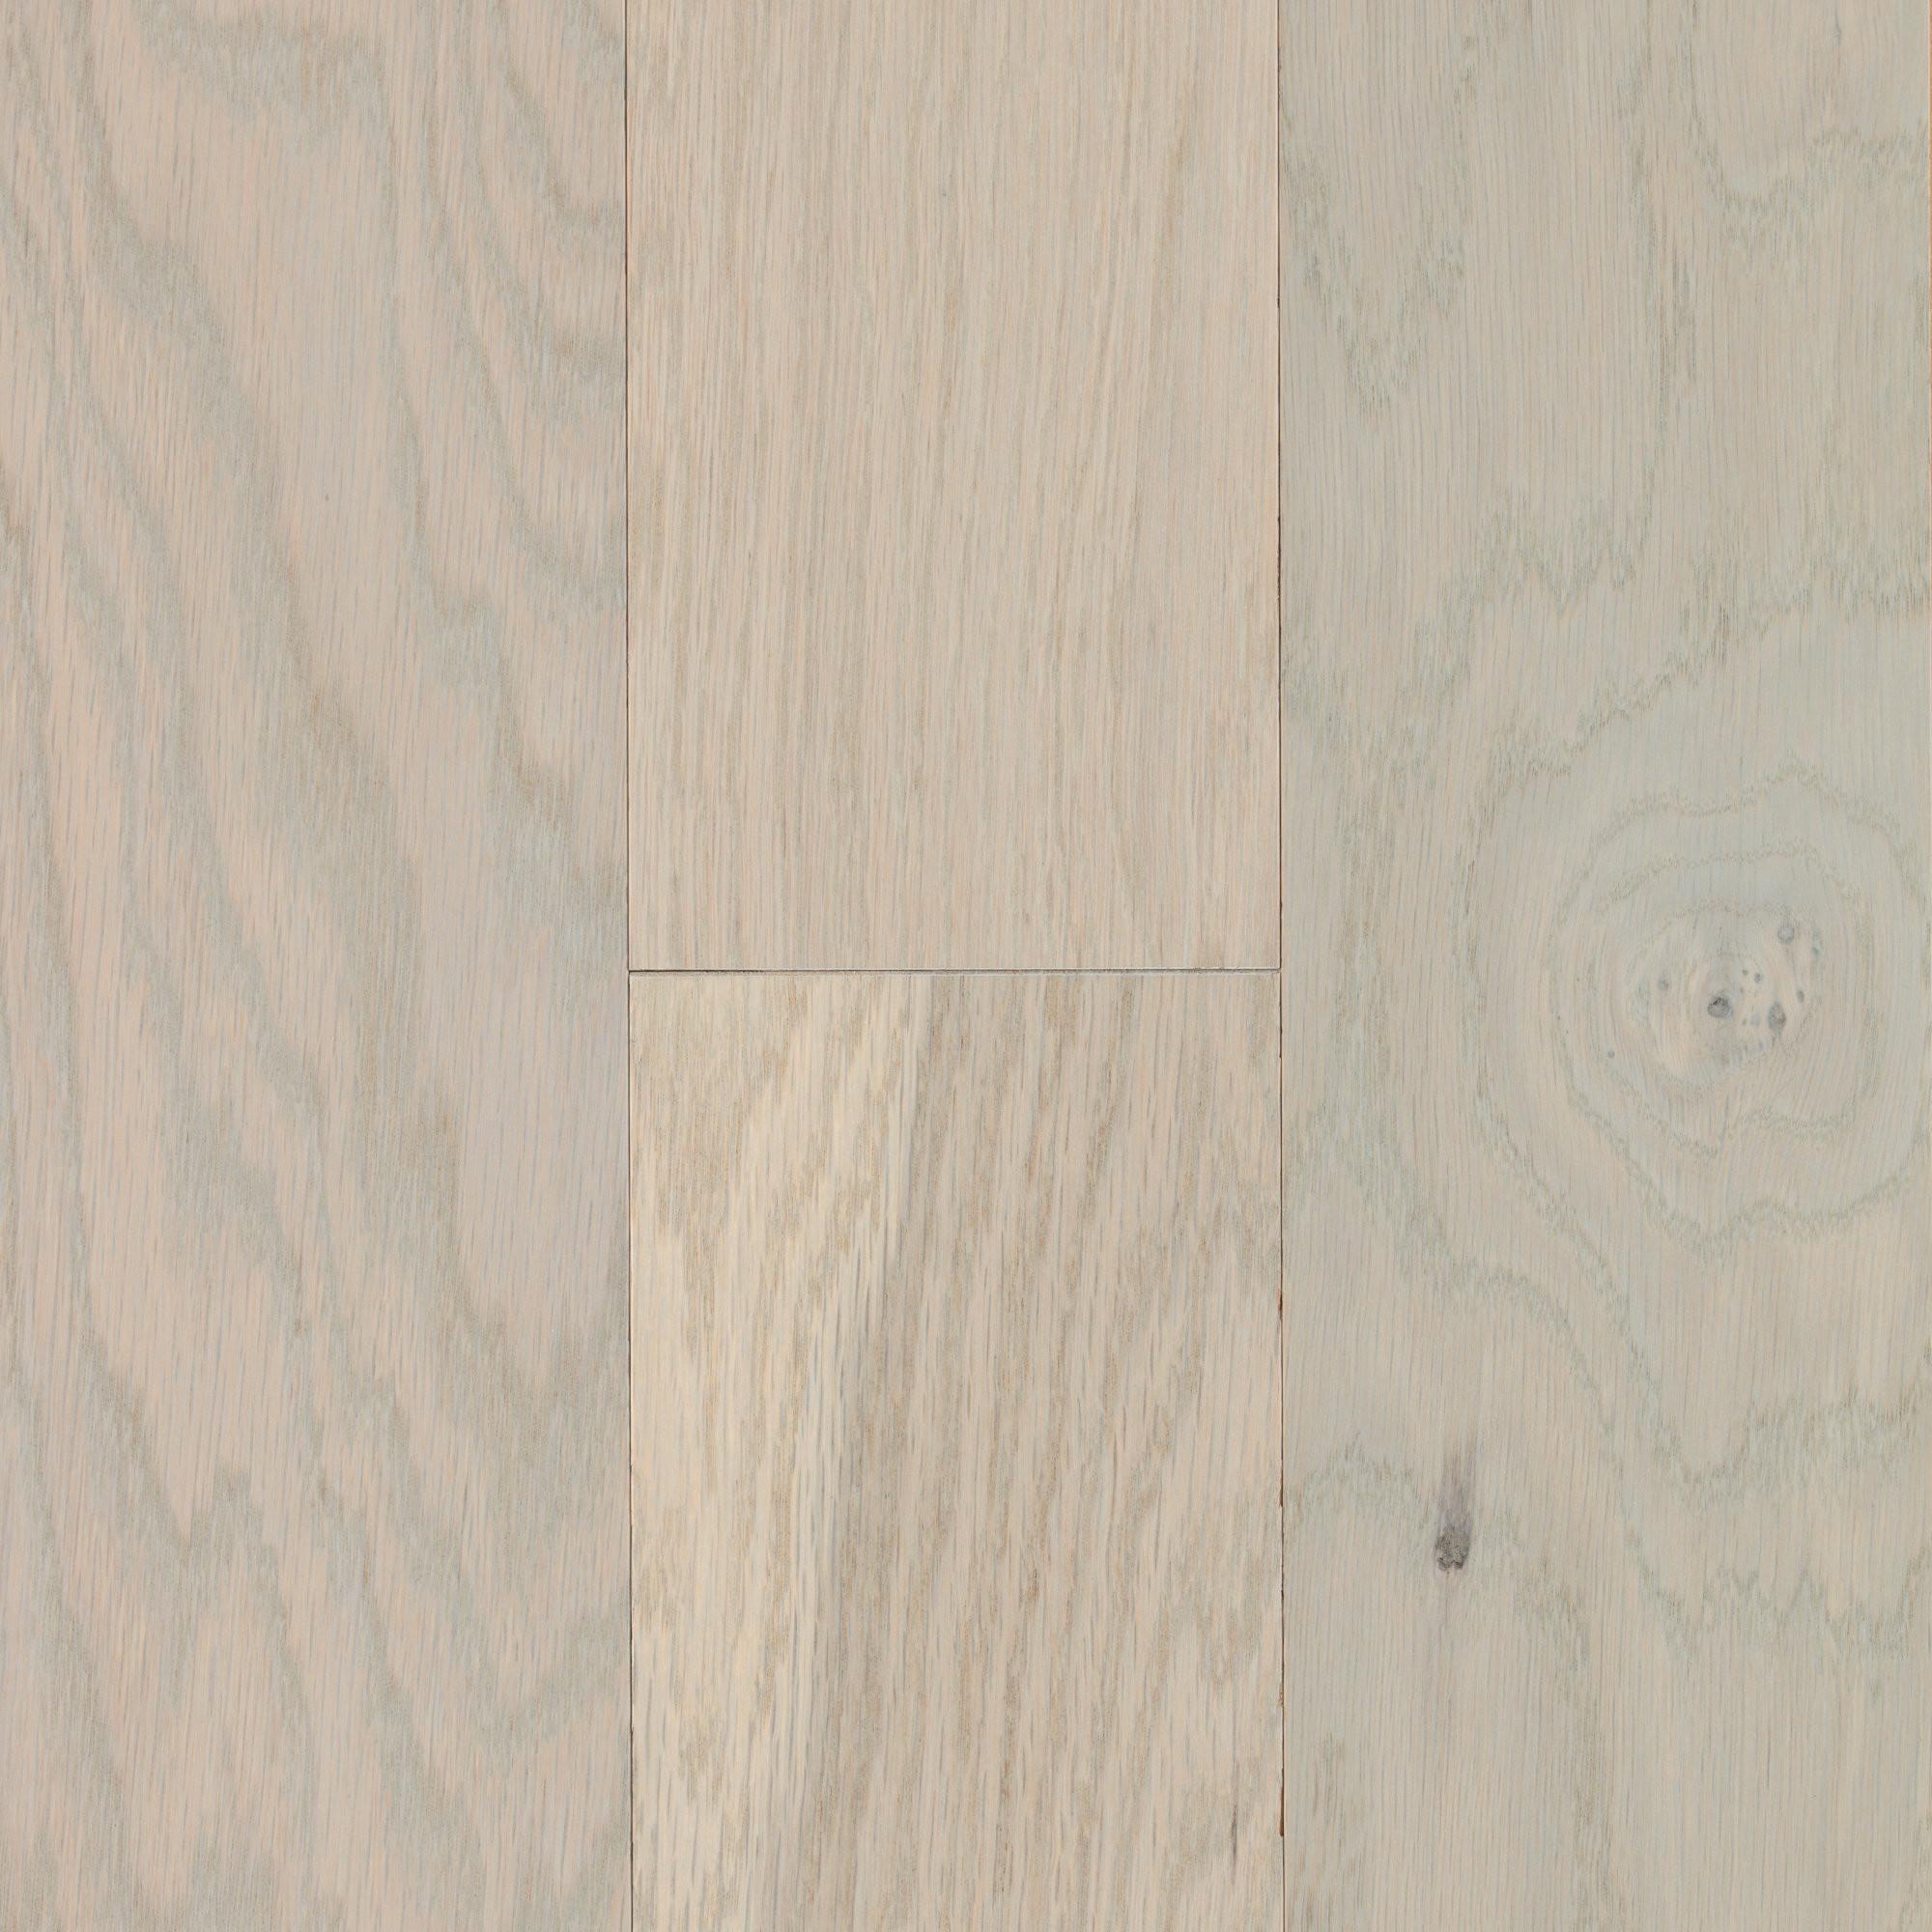 5 engineered hickory hardwood flooring in germain of mohawk city escape 5 engineered oak hardwood flooring in miami inside mohawk city escape 5 engineered oak hardwood flooring in miami white wayfair